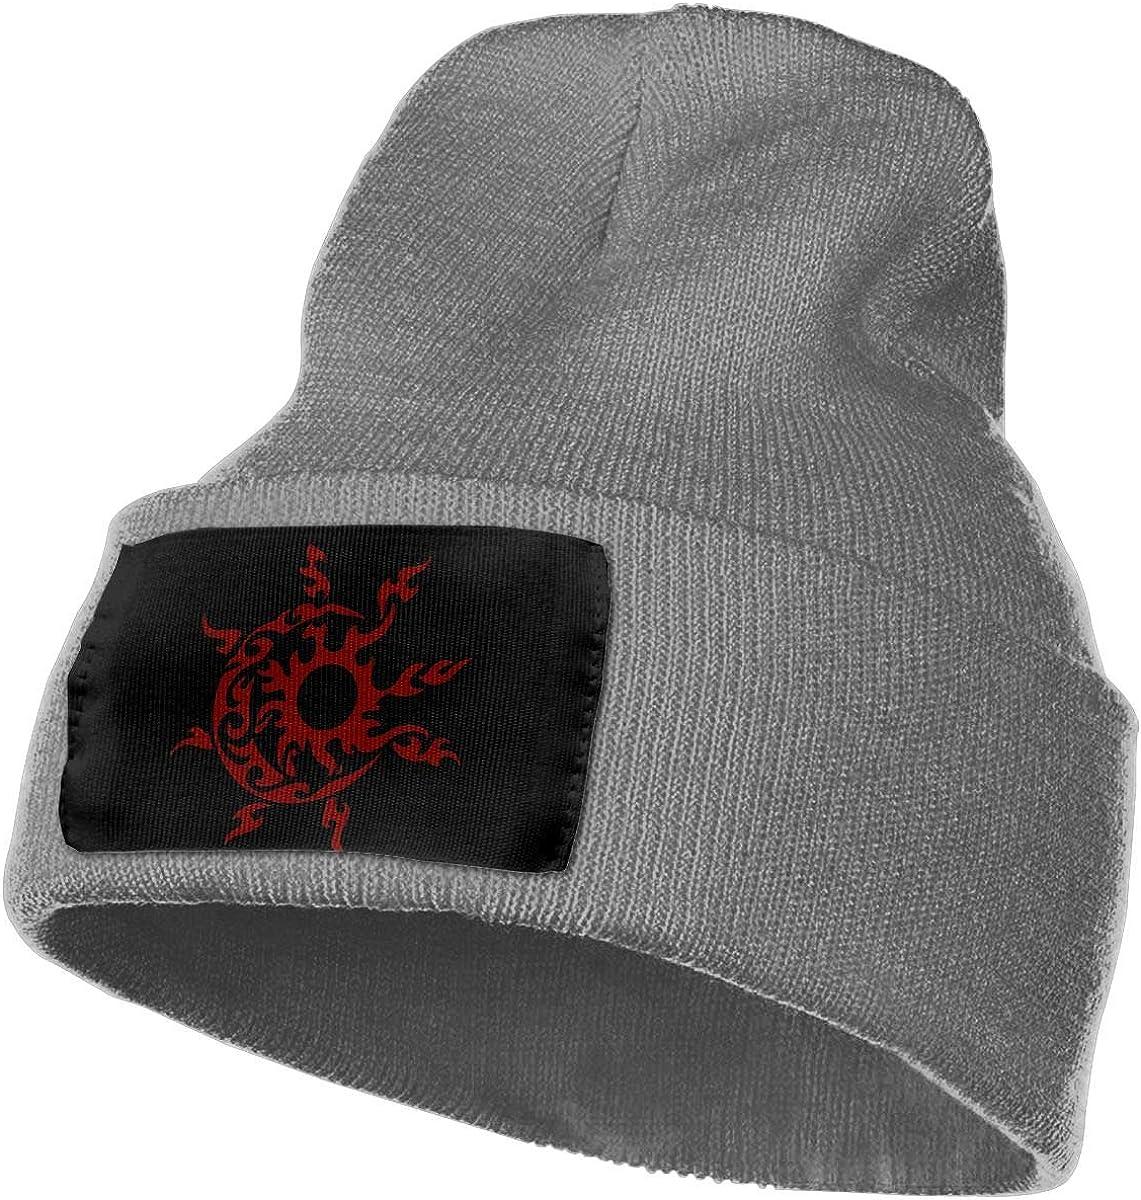 Tribal Star Sun Moon Warm Slouchy Beanie Hat Knitted Beanie Skully for Men Women